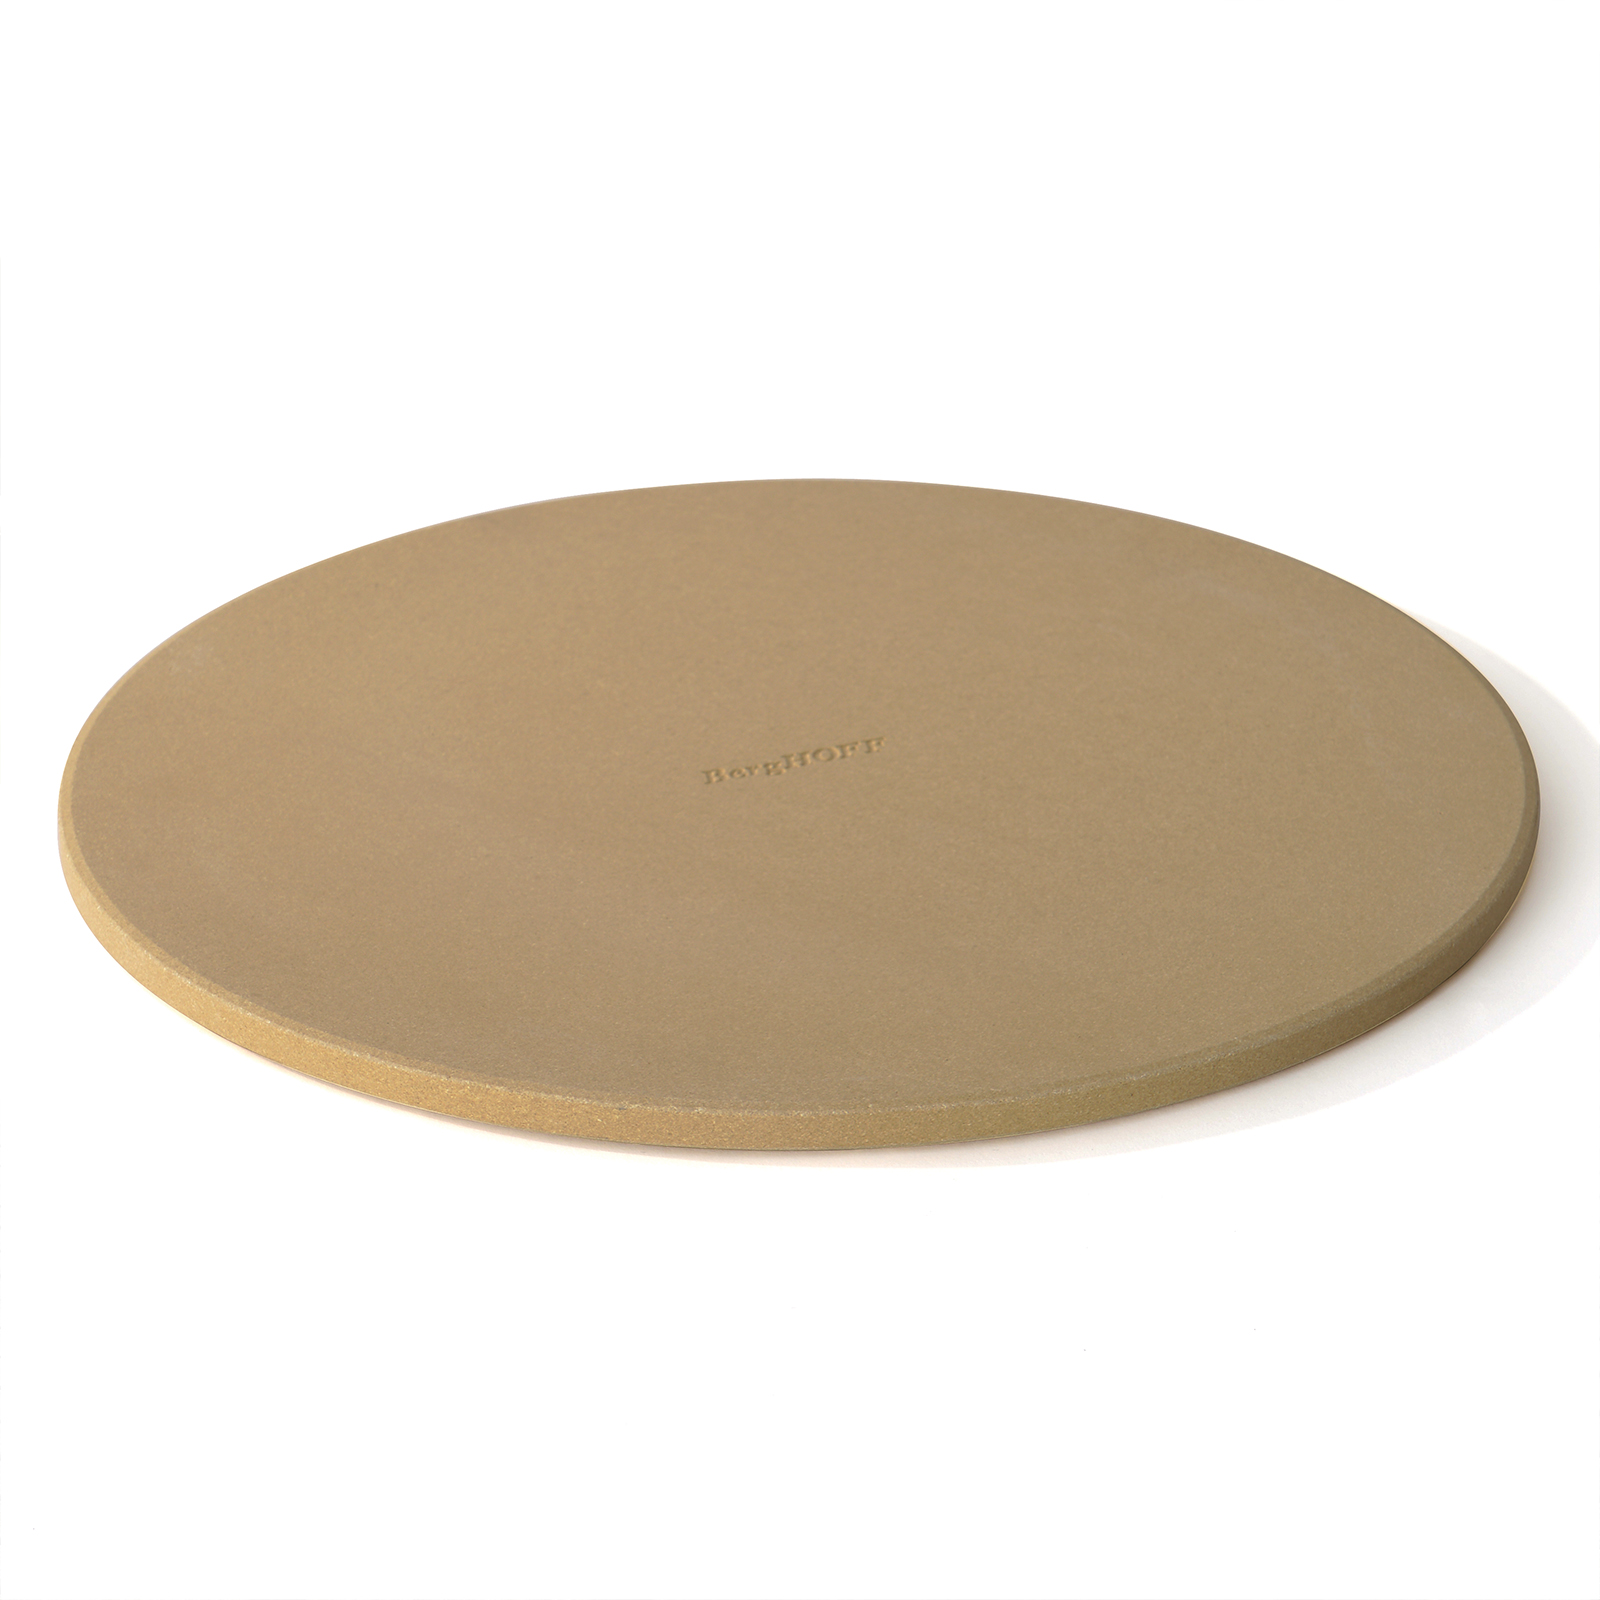 Pizza-Backstein 23cm - Ron